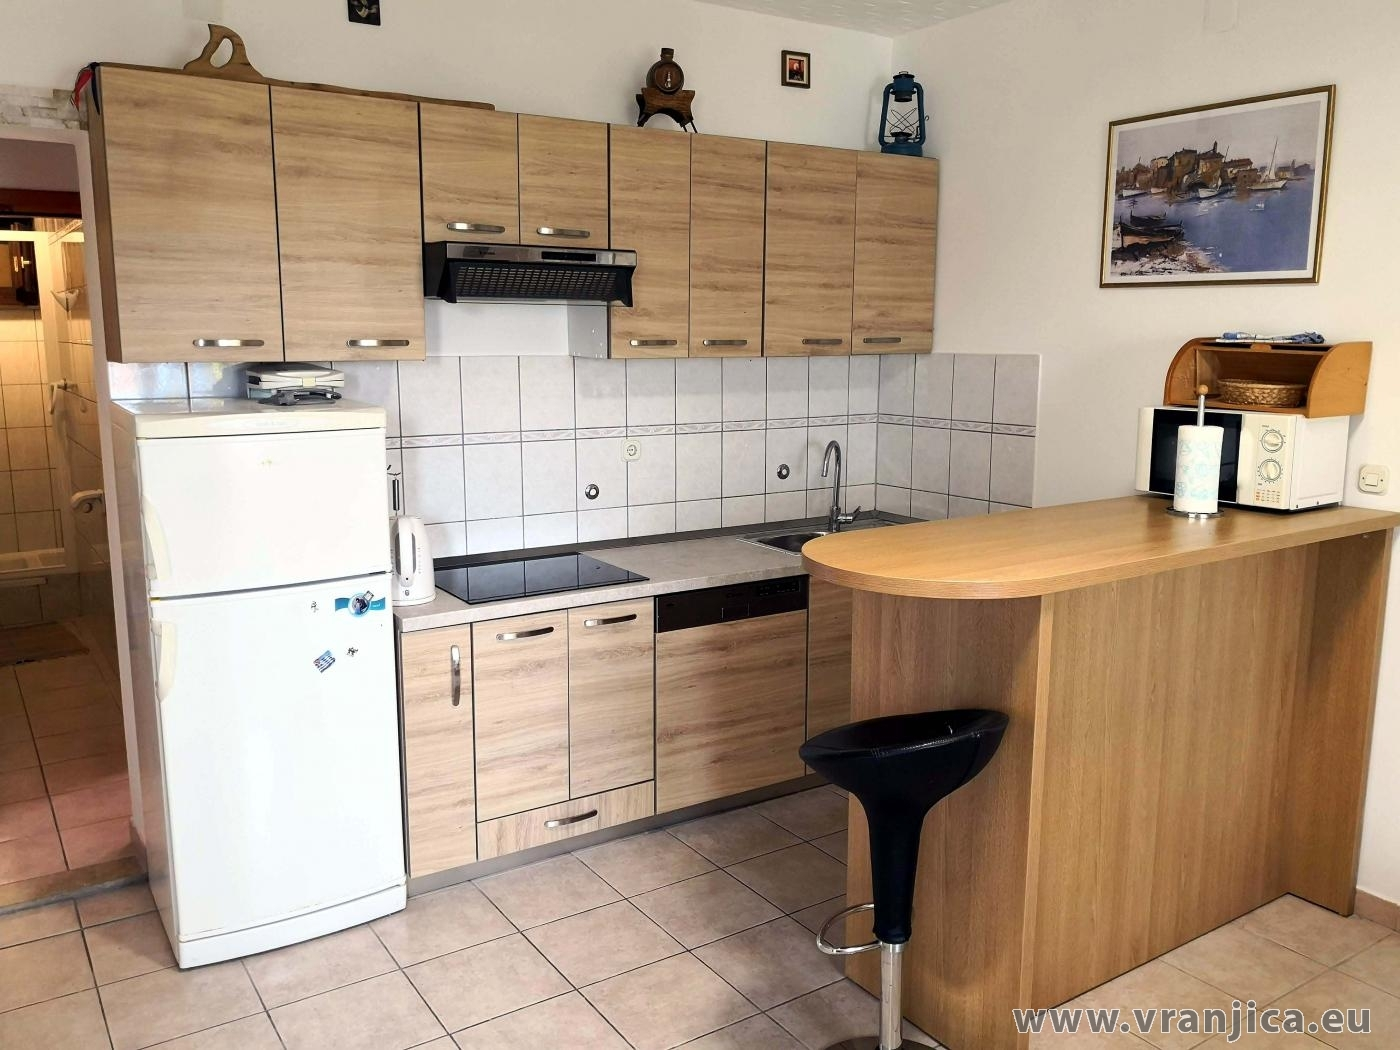 https://www.vranjica.eu/pokoje/apartman-martin-ap1-2-2-1573305071L.jpg